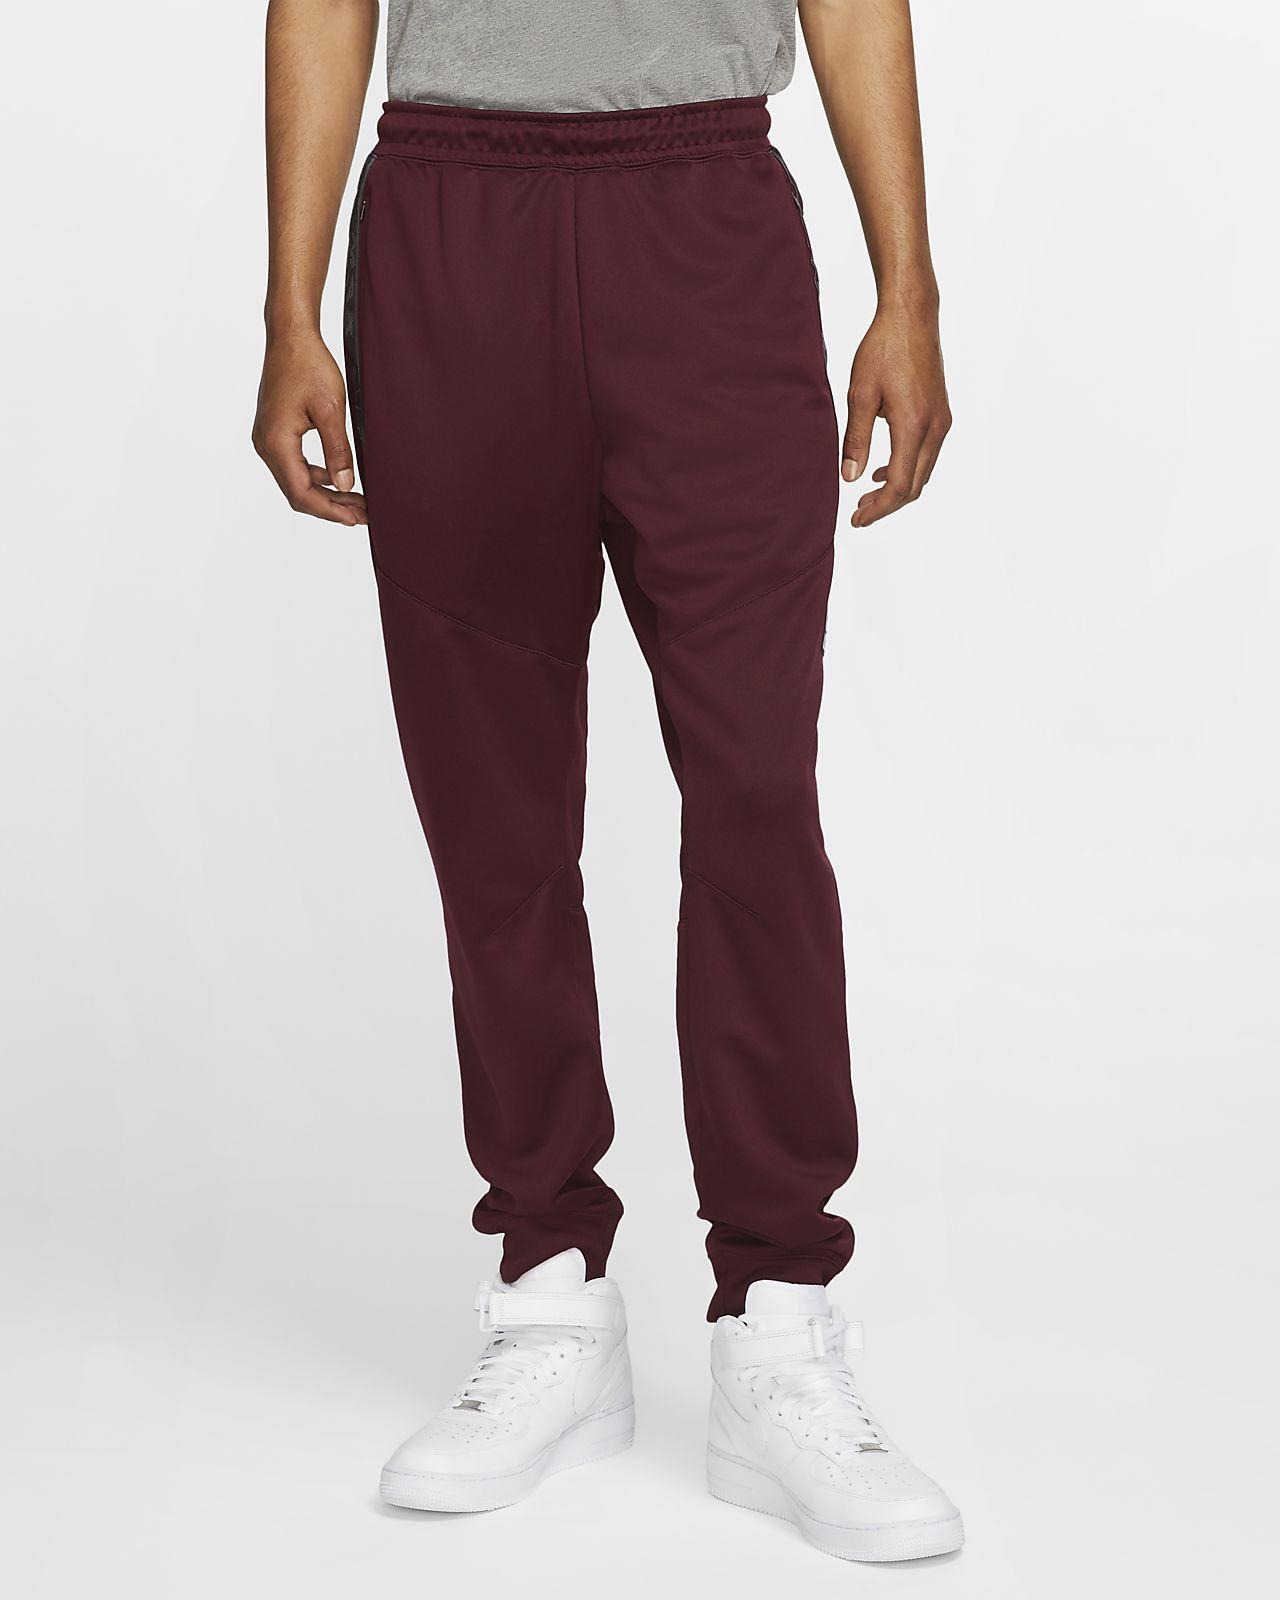 Pantalon de jogging Nike Sportswear Air Max pour Homme